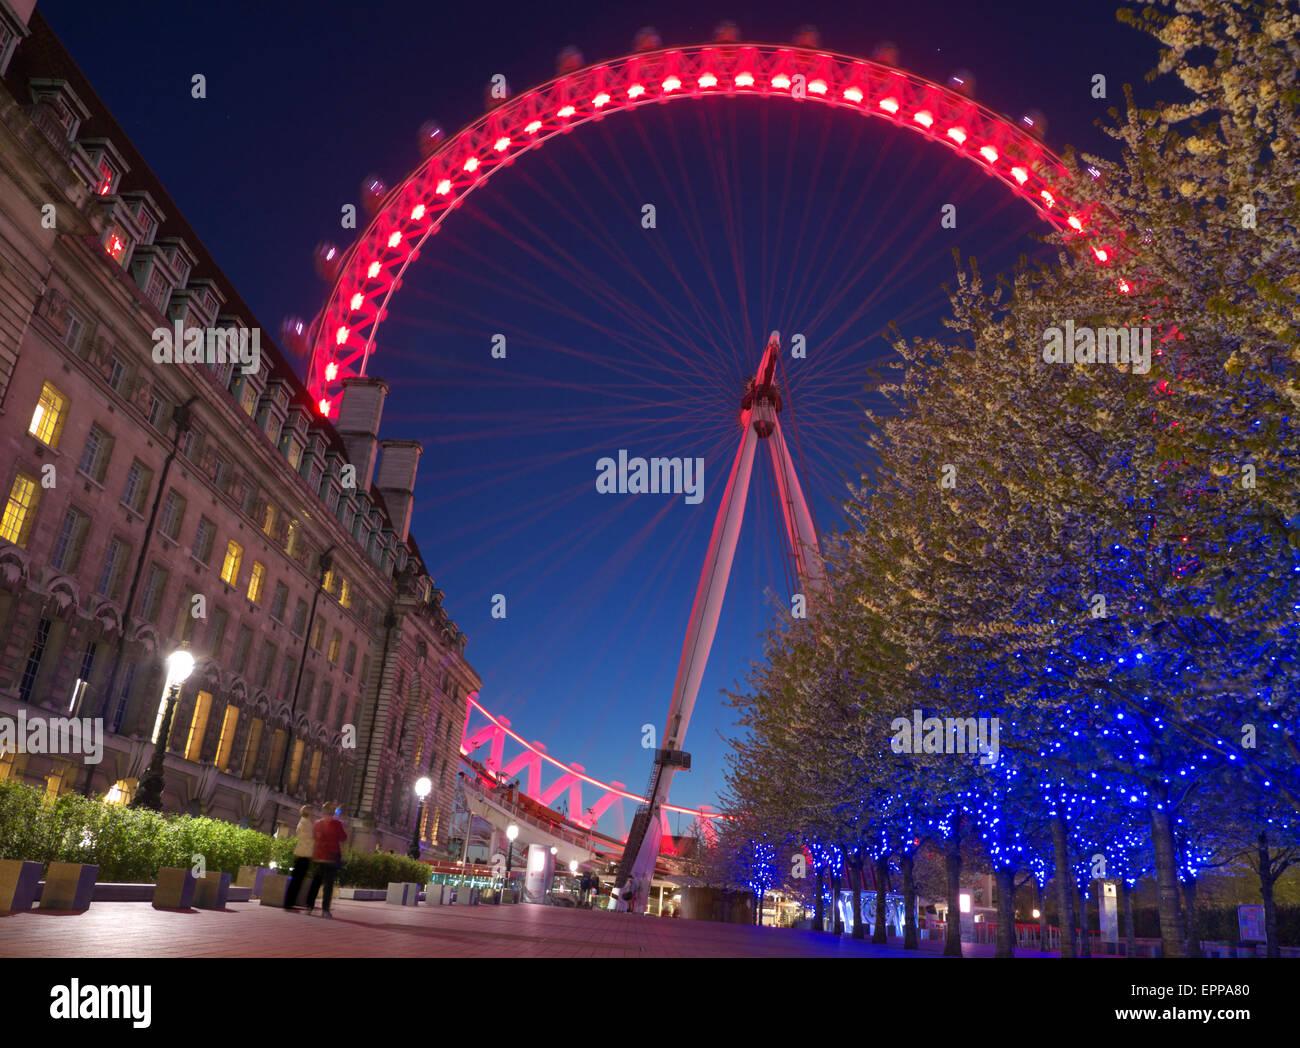 The London Eye at dusk South Bank London, England UK- Ian Shaw - Stock Image